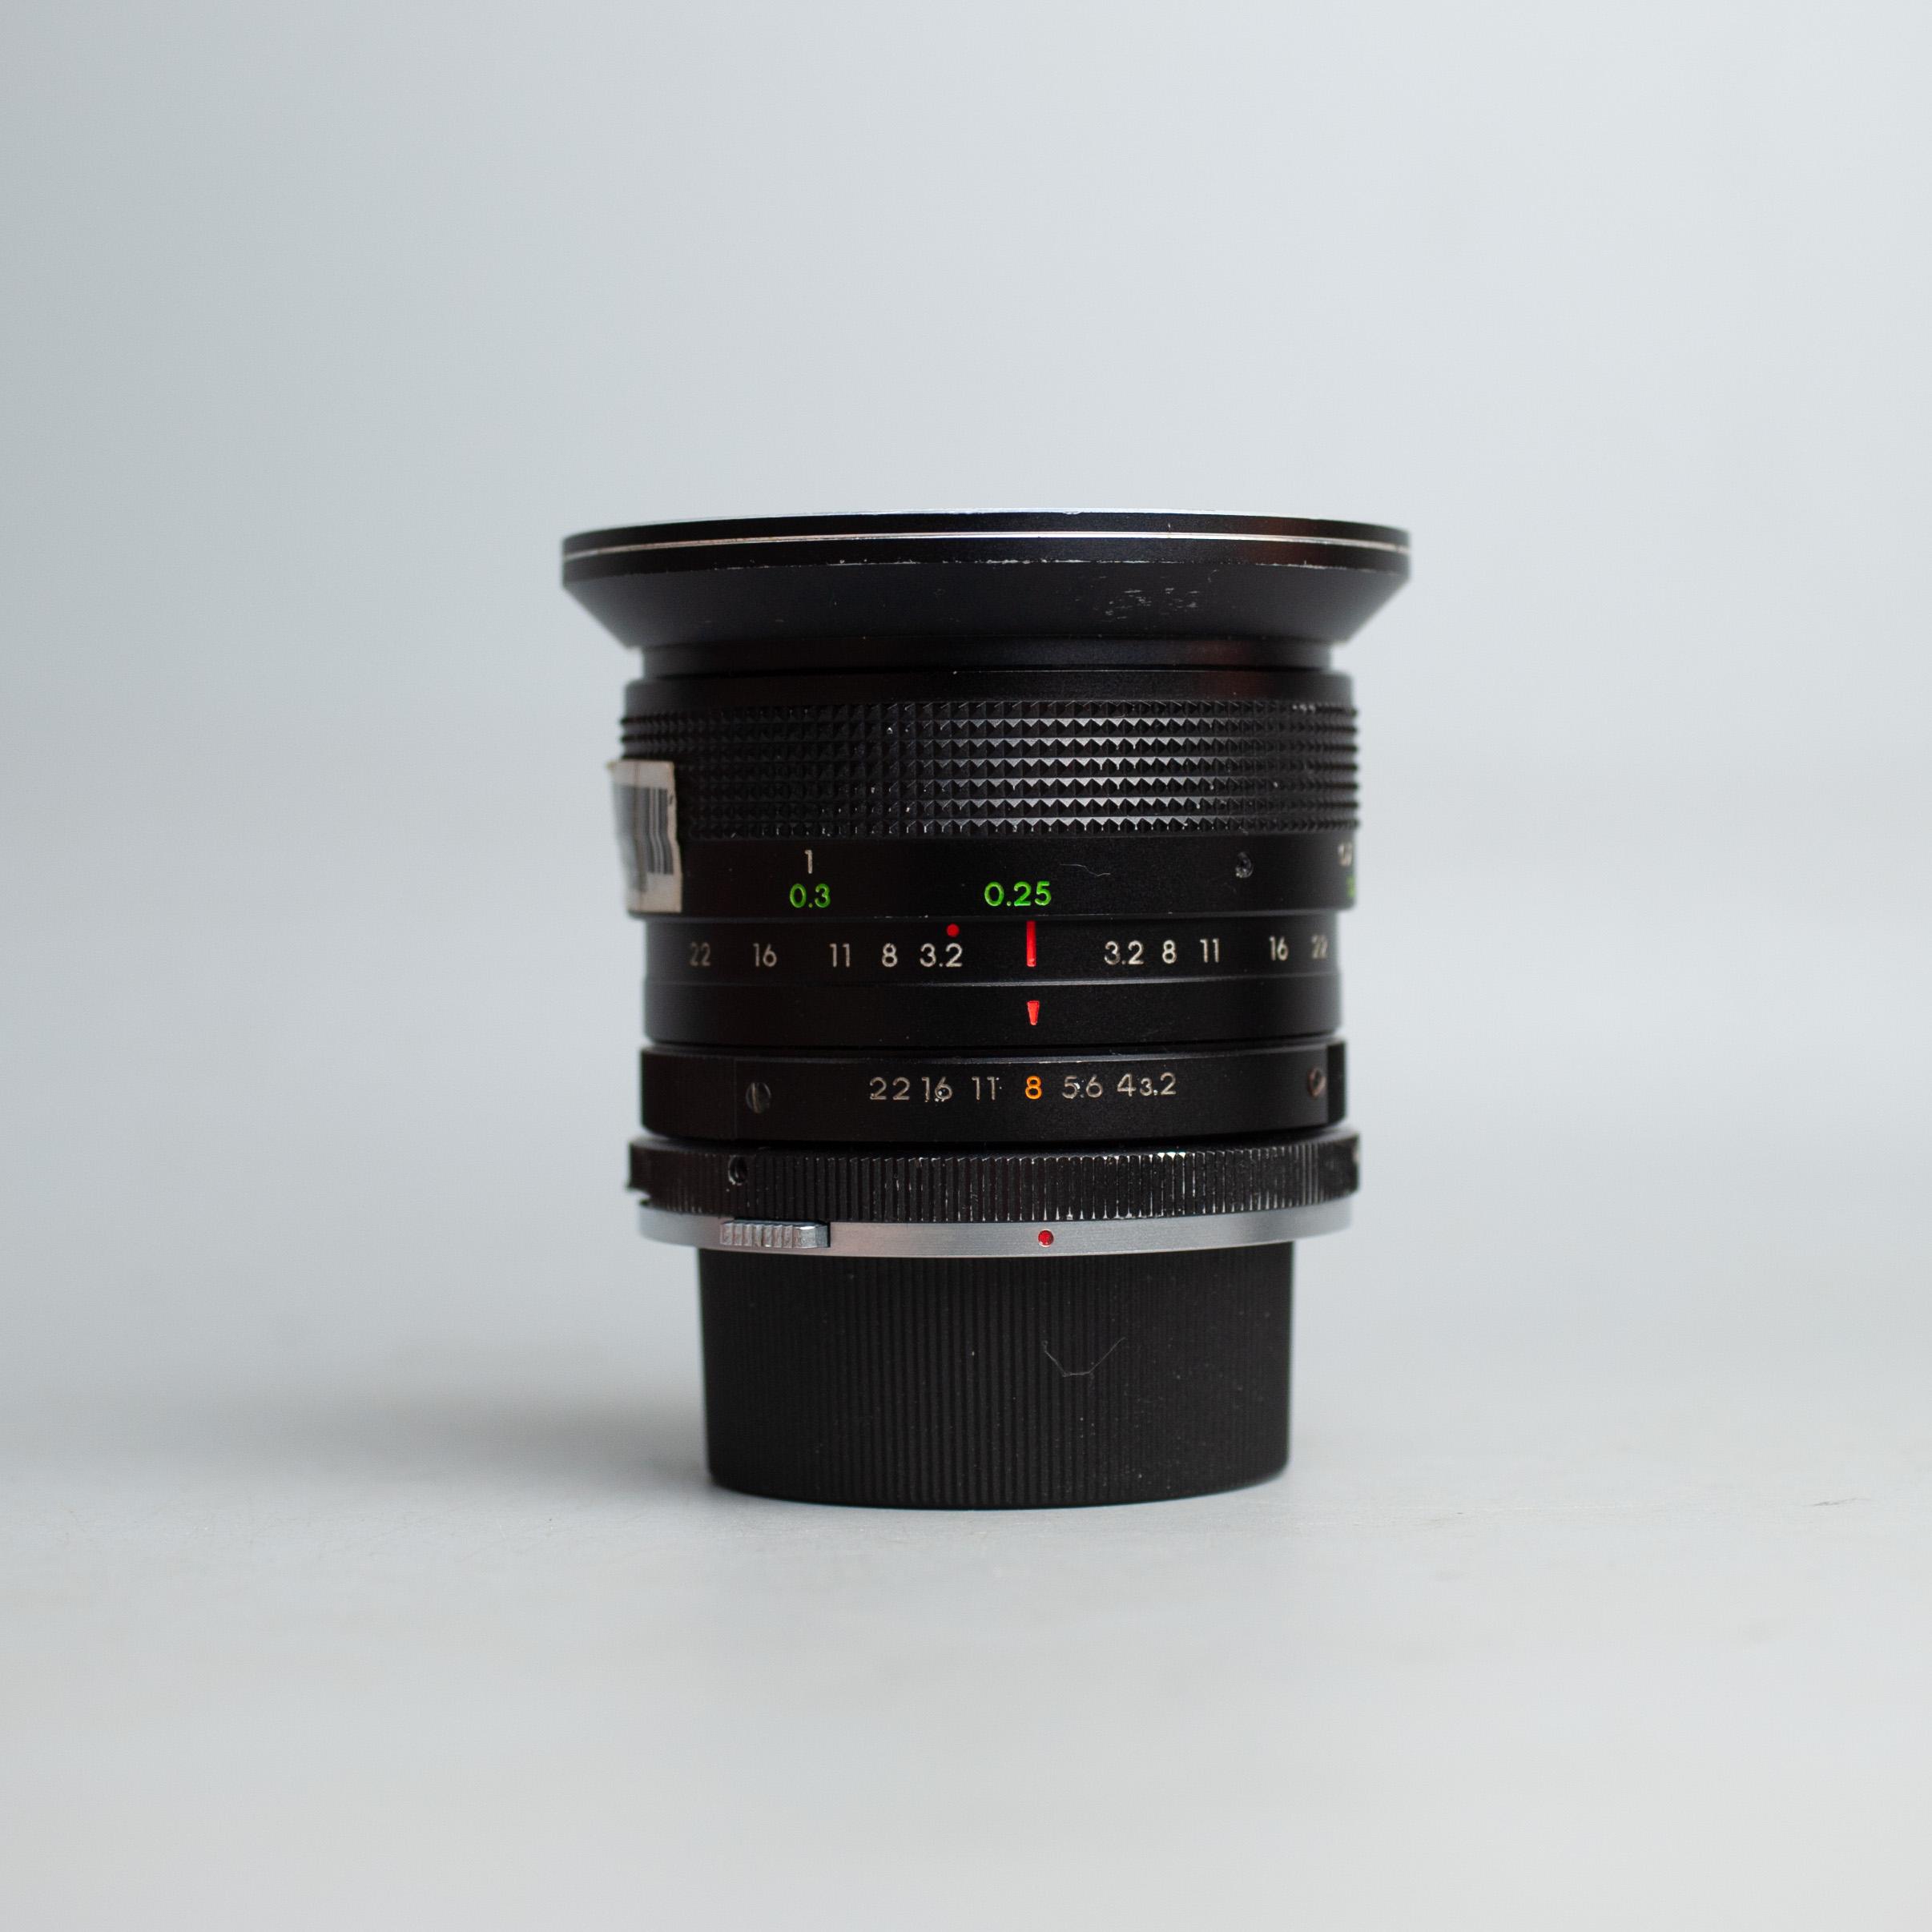 spiratone-18mm-f3-2-mf-olympus-om-18-3-2-10488